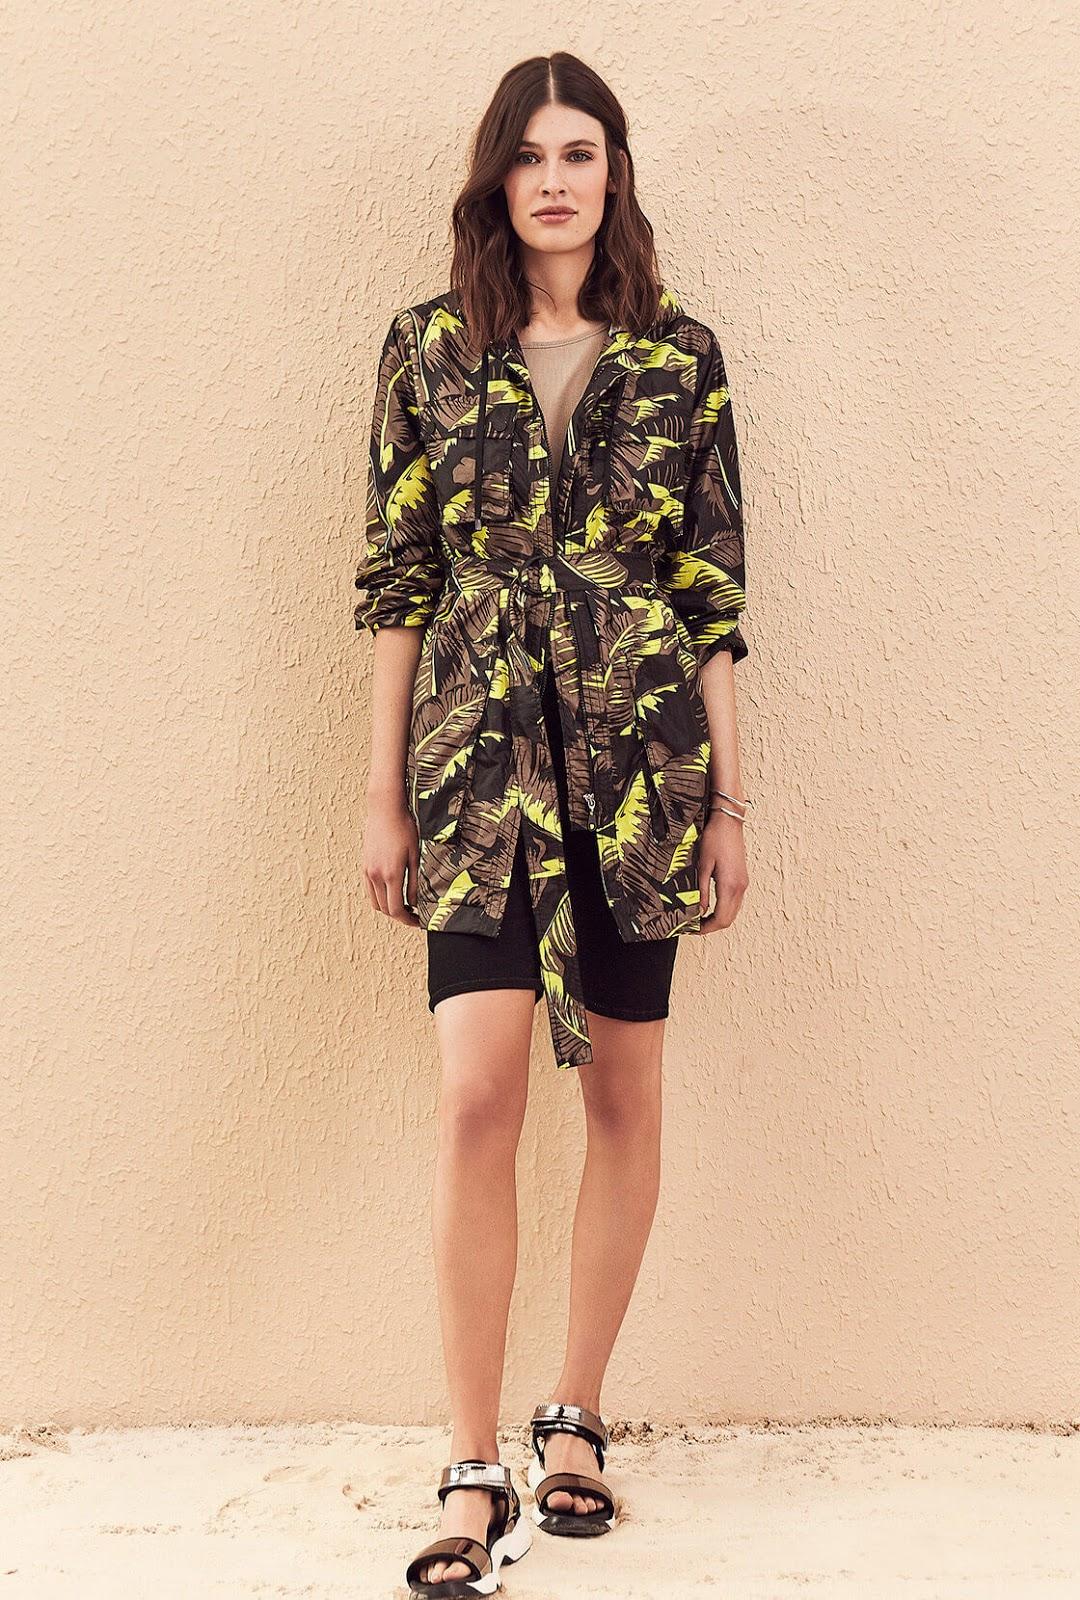 Moda casual urbana para mujer primavera verano 2020.